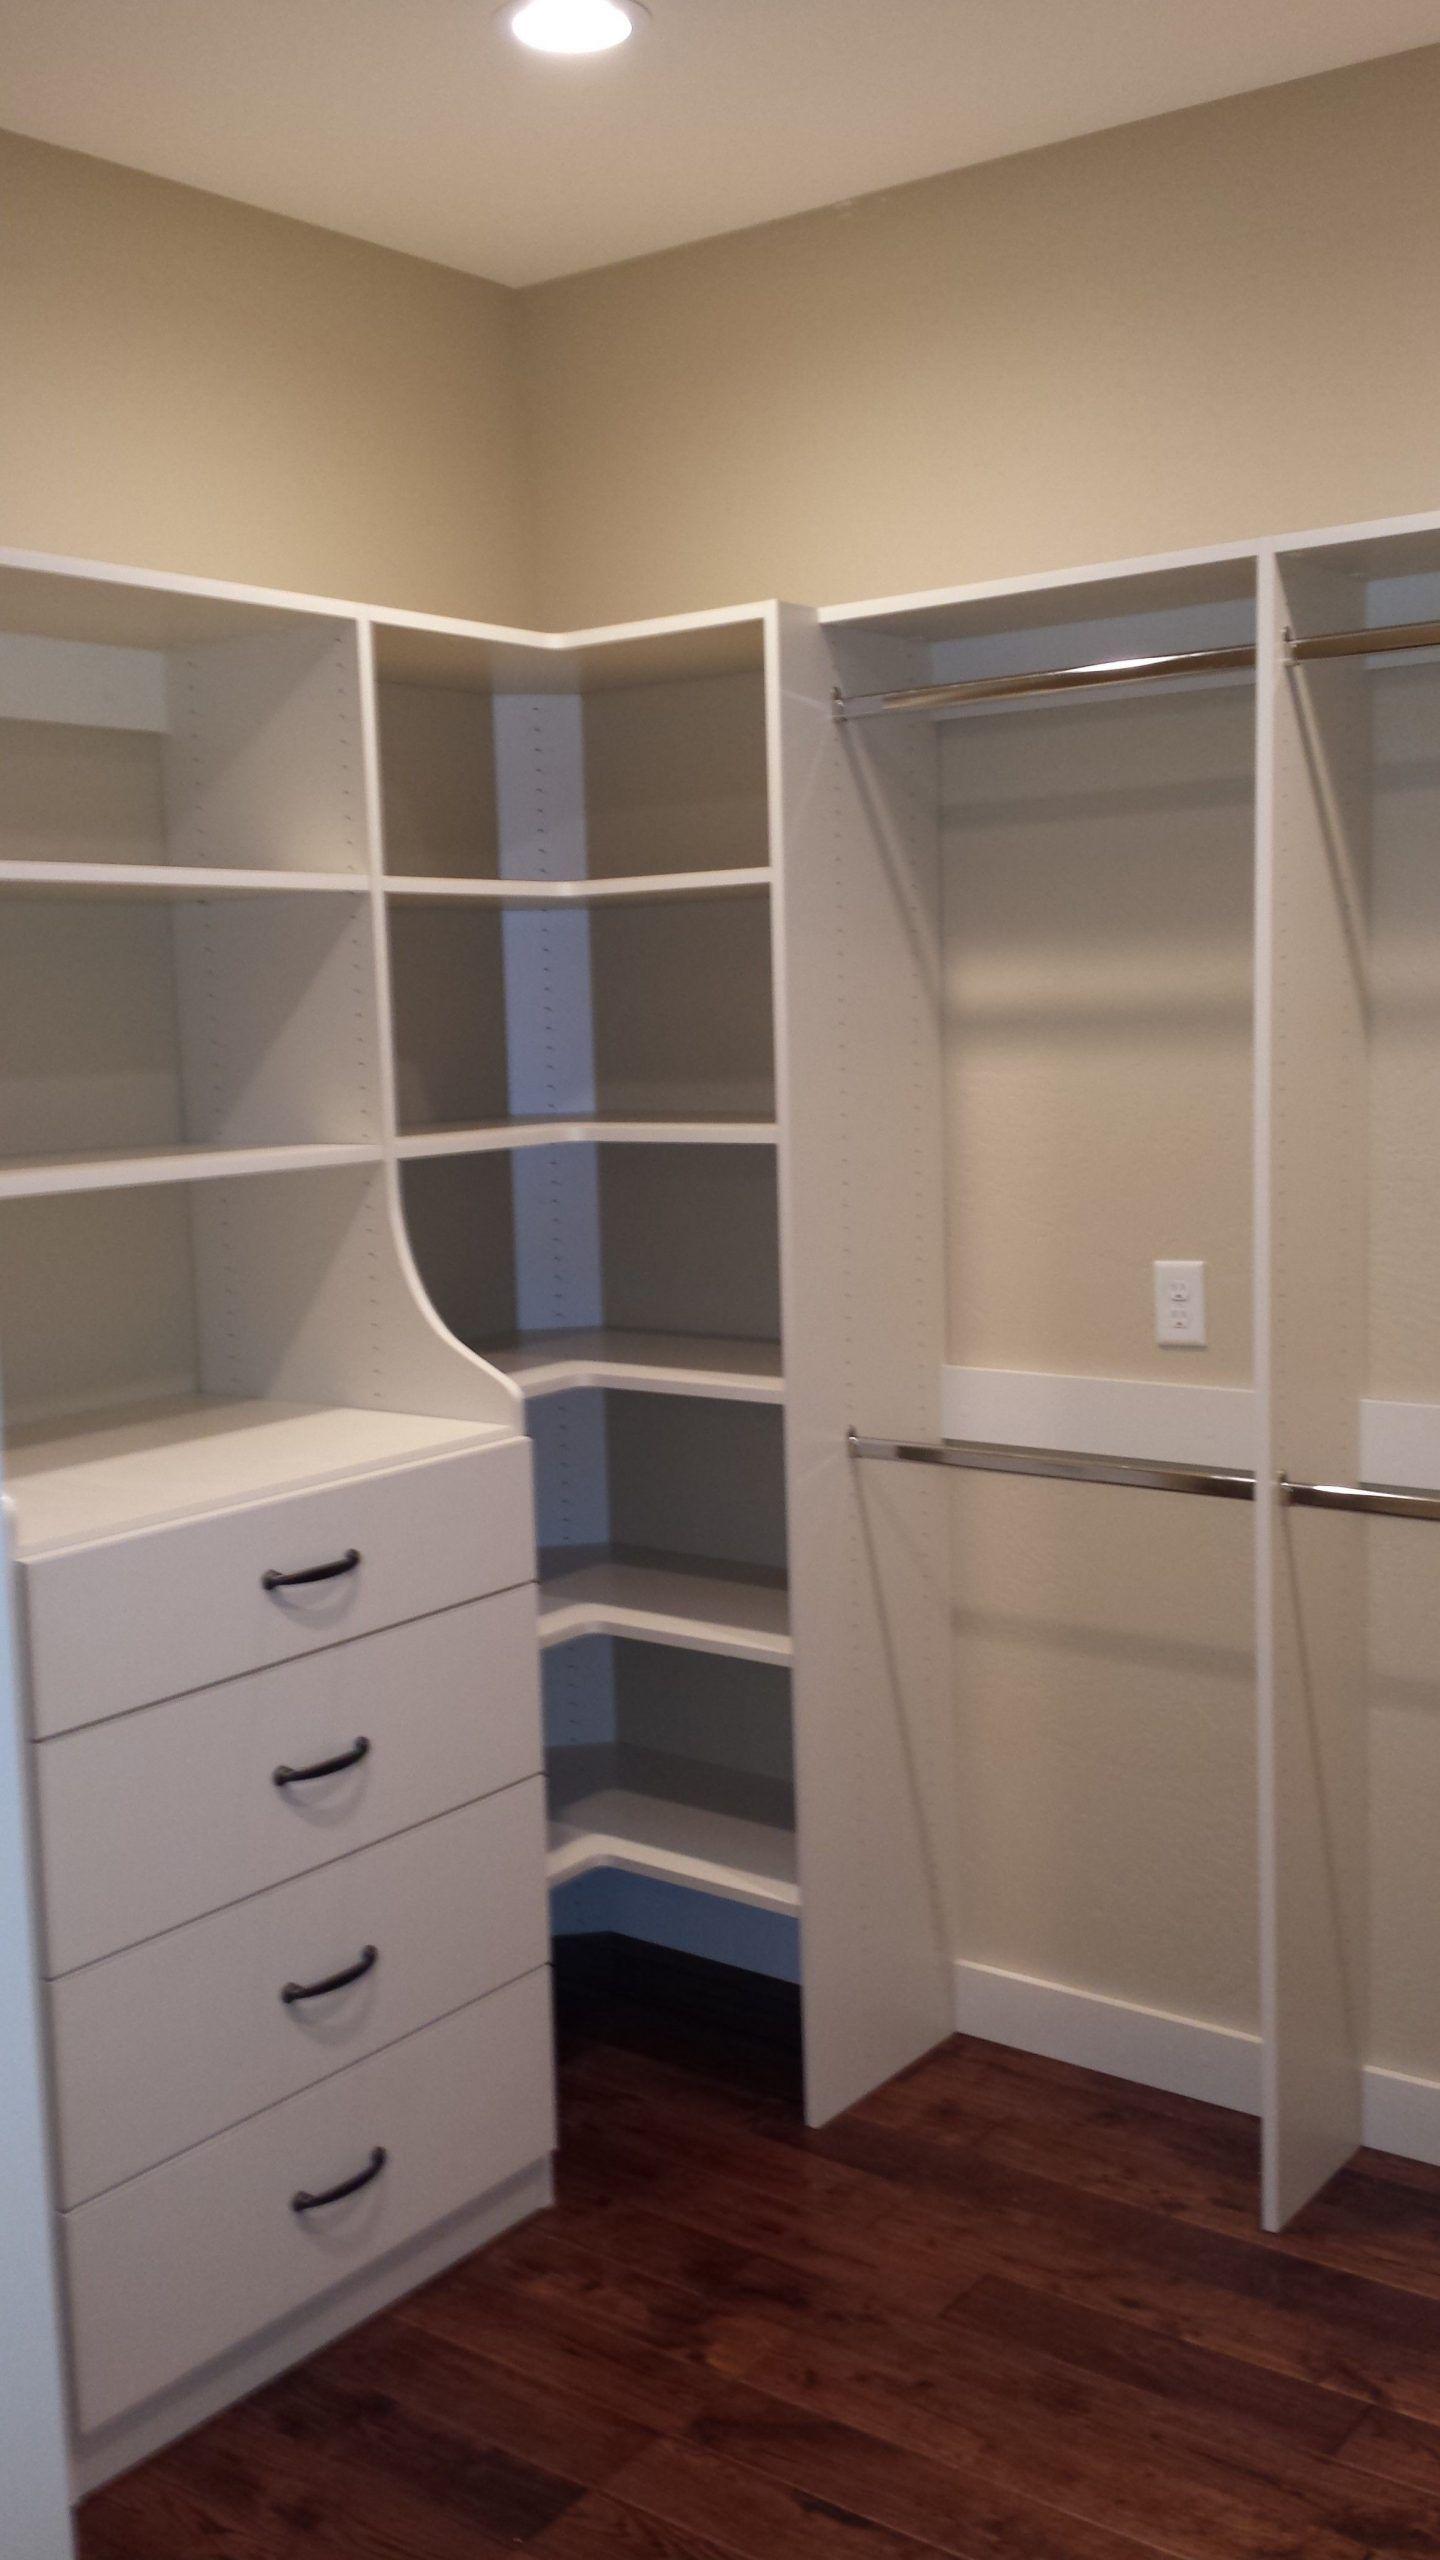 Lowes Closet Design : lowes, closet, design, Lowes, Closet, Organizers, Shelving, Ideas, Depot, System#, #depot, #home, #id…, Layout,, Organization,, Corner, Shelves